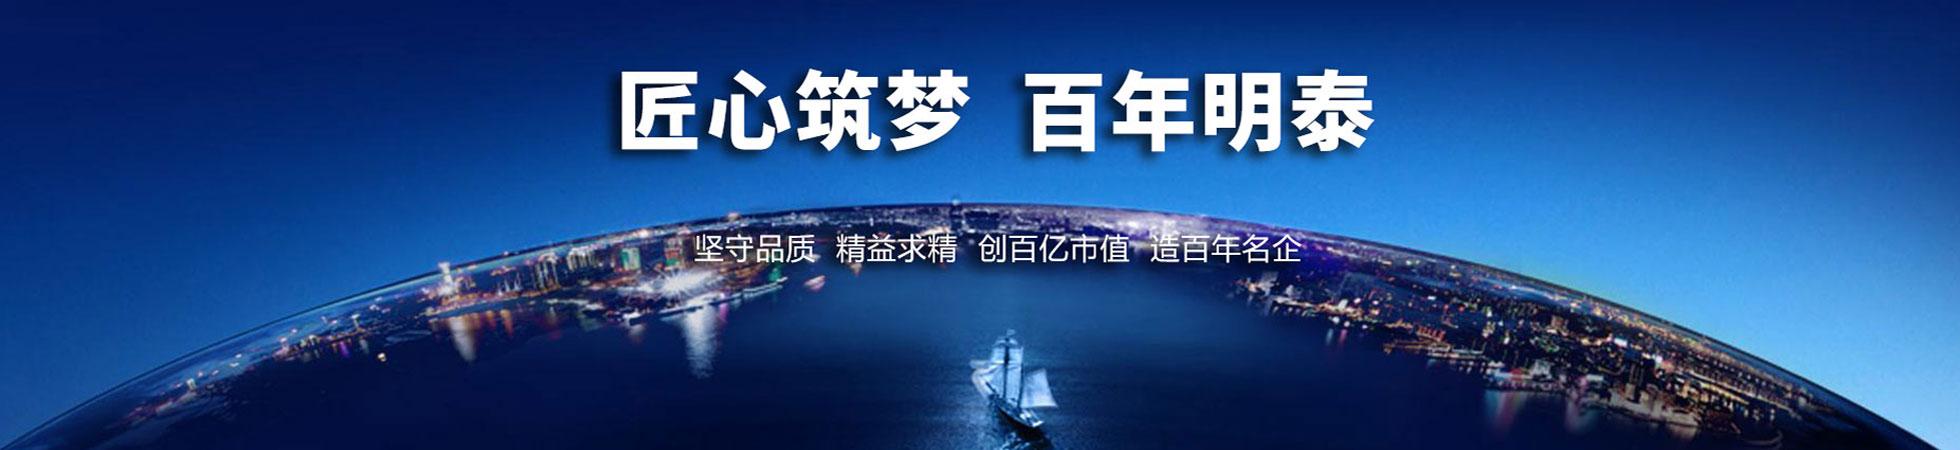 山(shan)東(dong)1060鋁(lv)板(ban)廠家